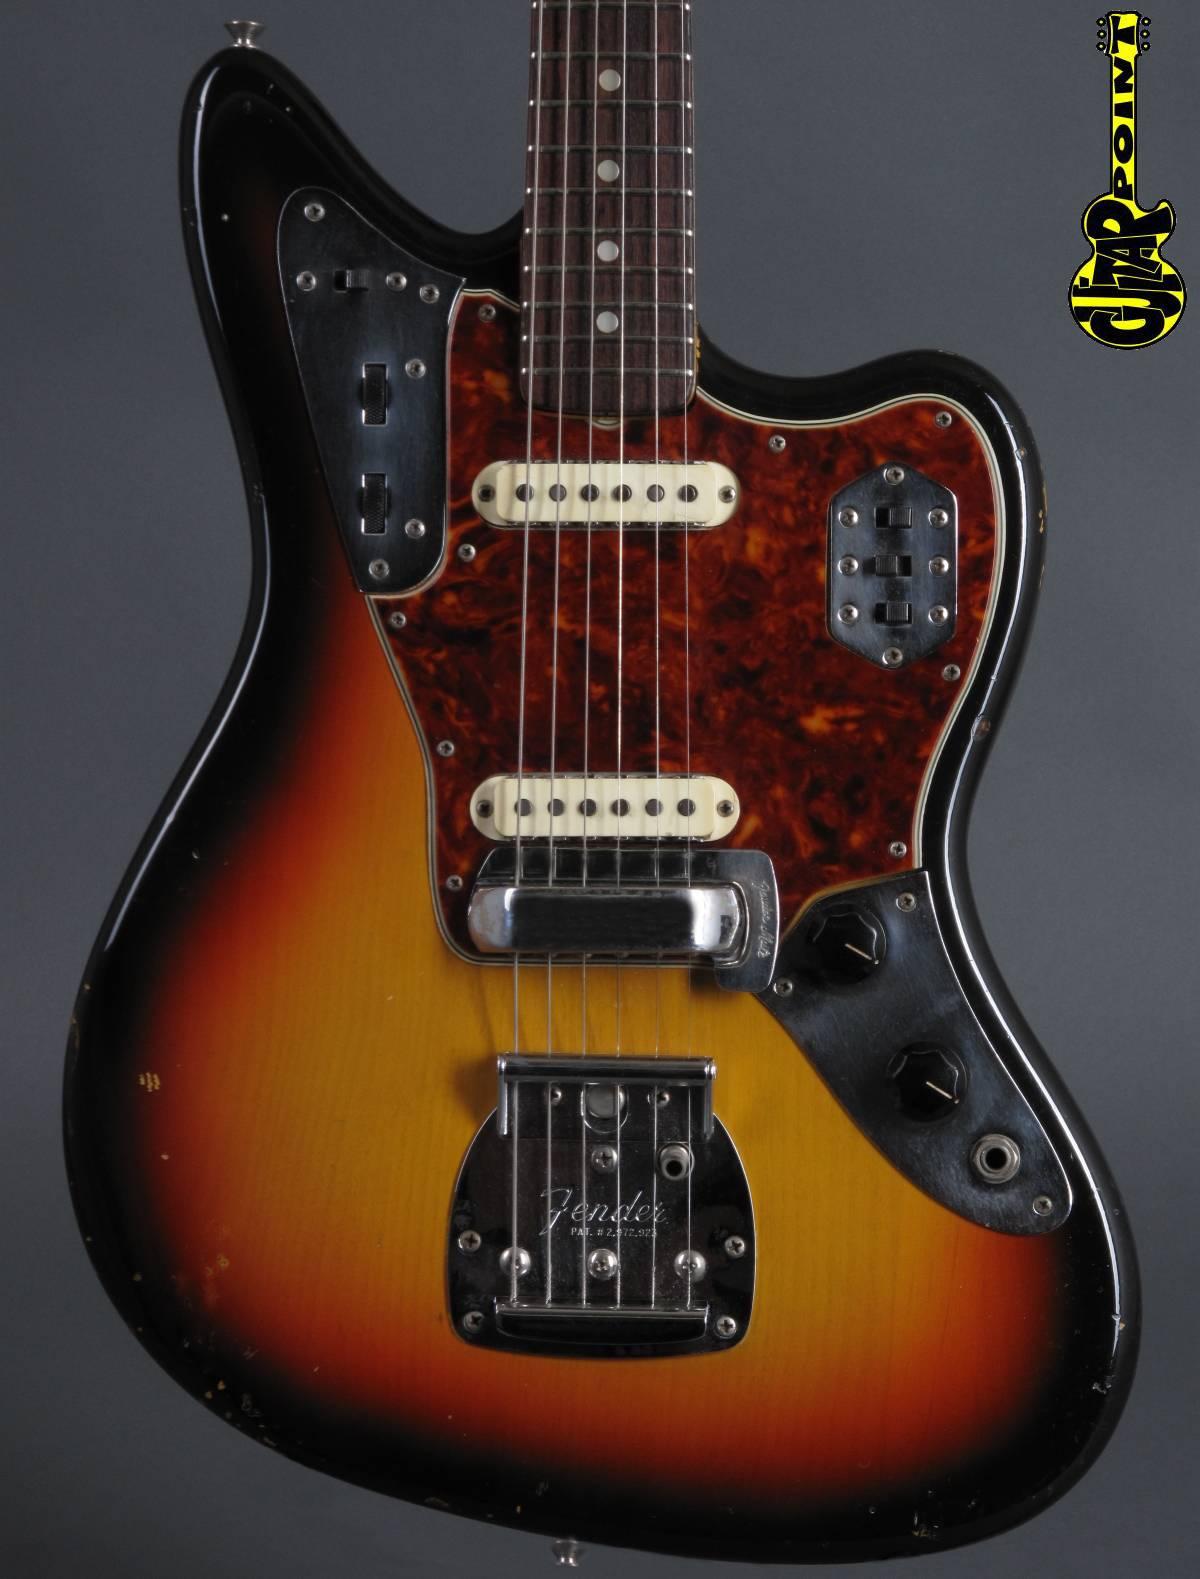 1965 Fender Jaguar – 3-tone Sunburst